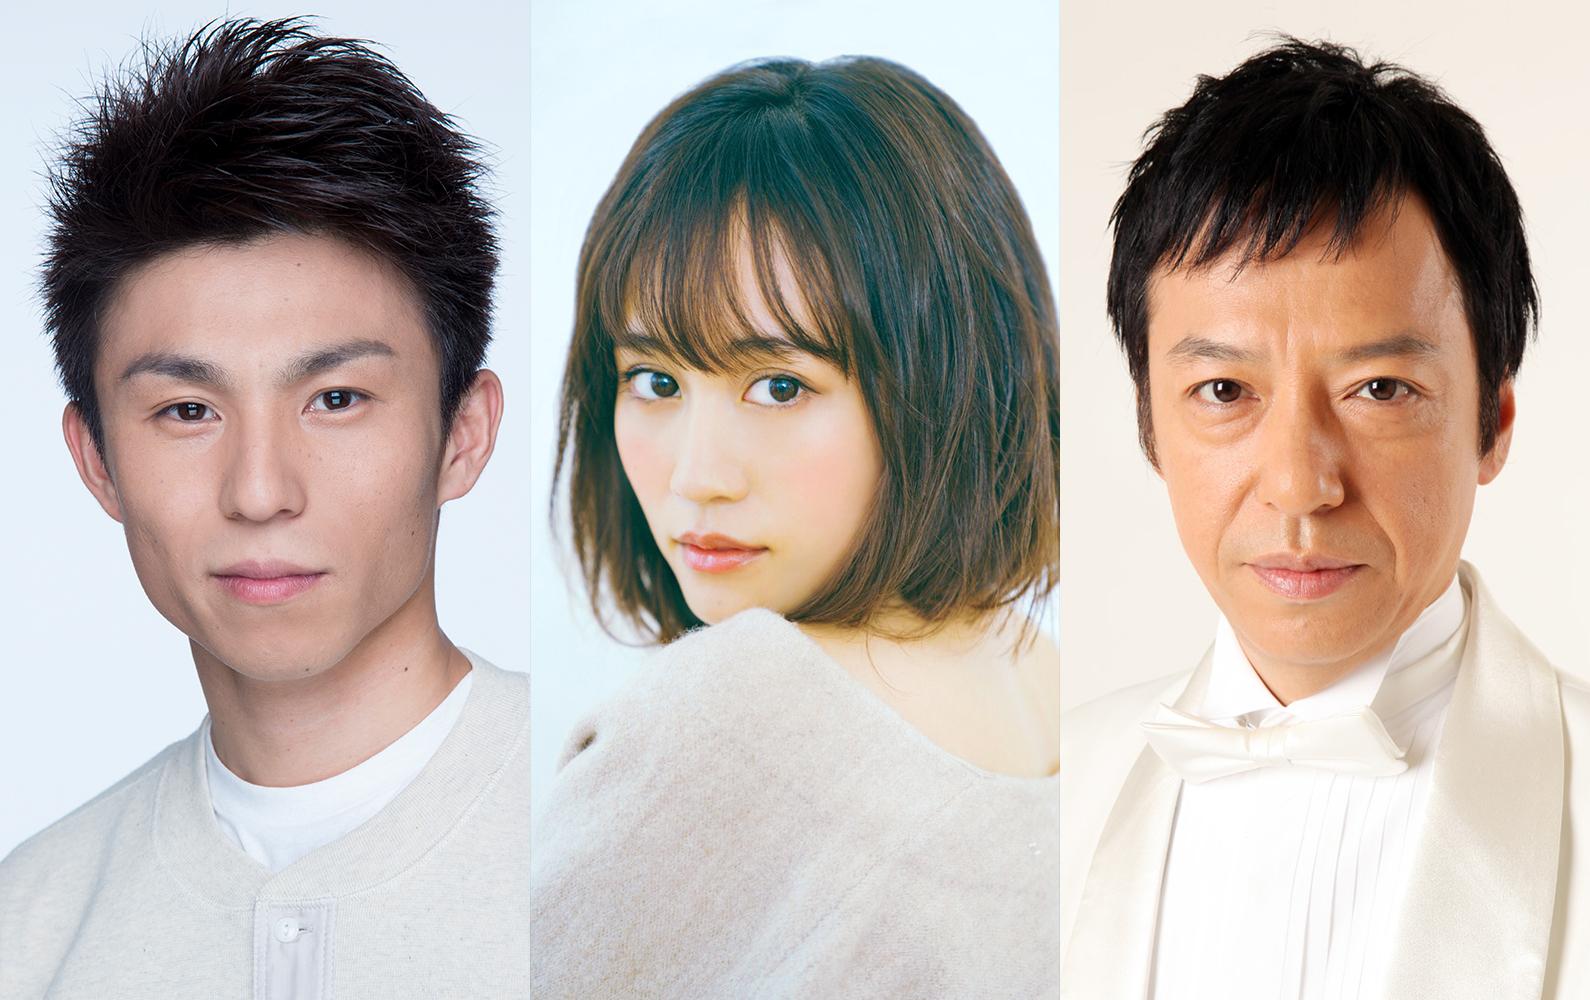 (左から)中尾明慶、前田敦子、板尾創路